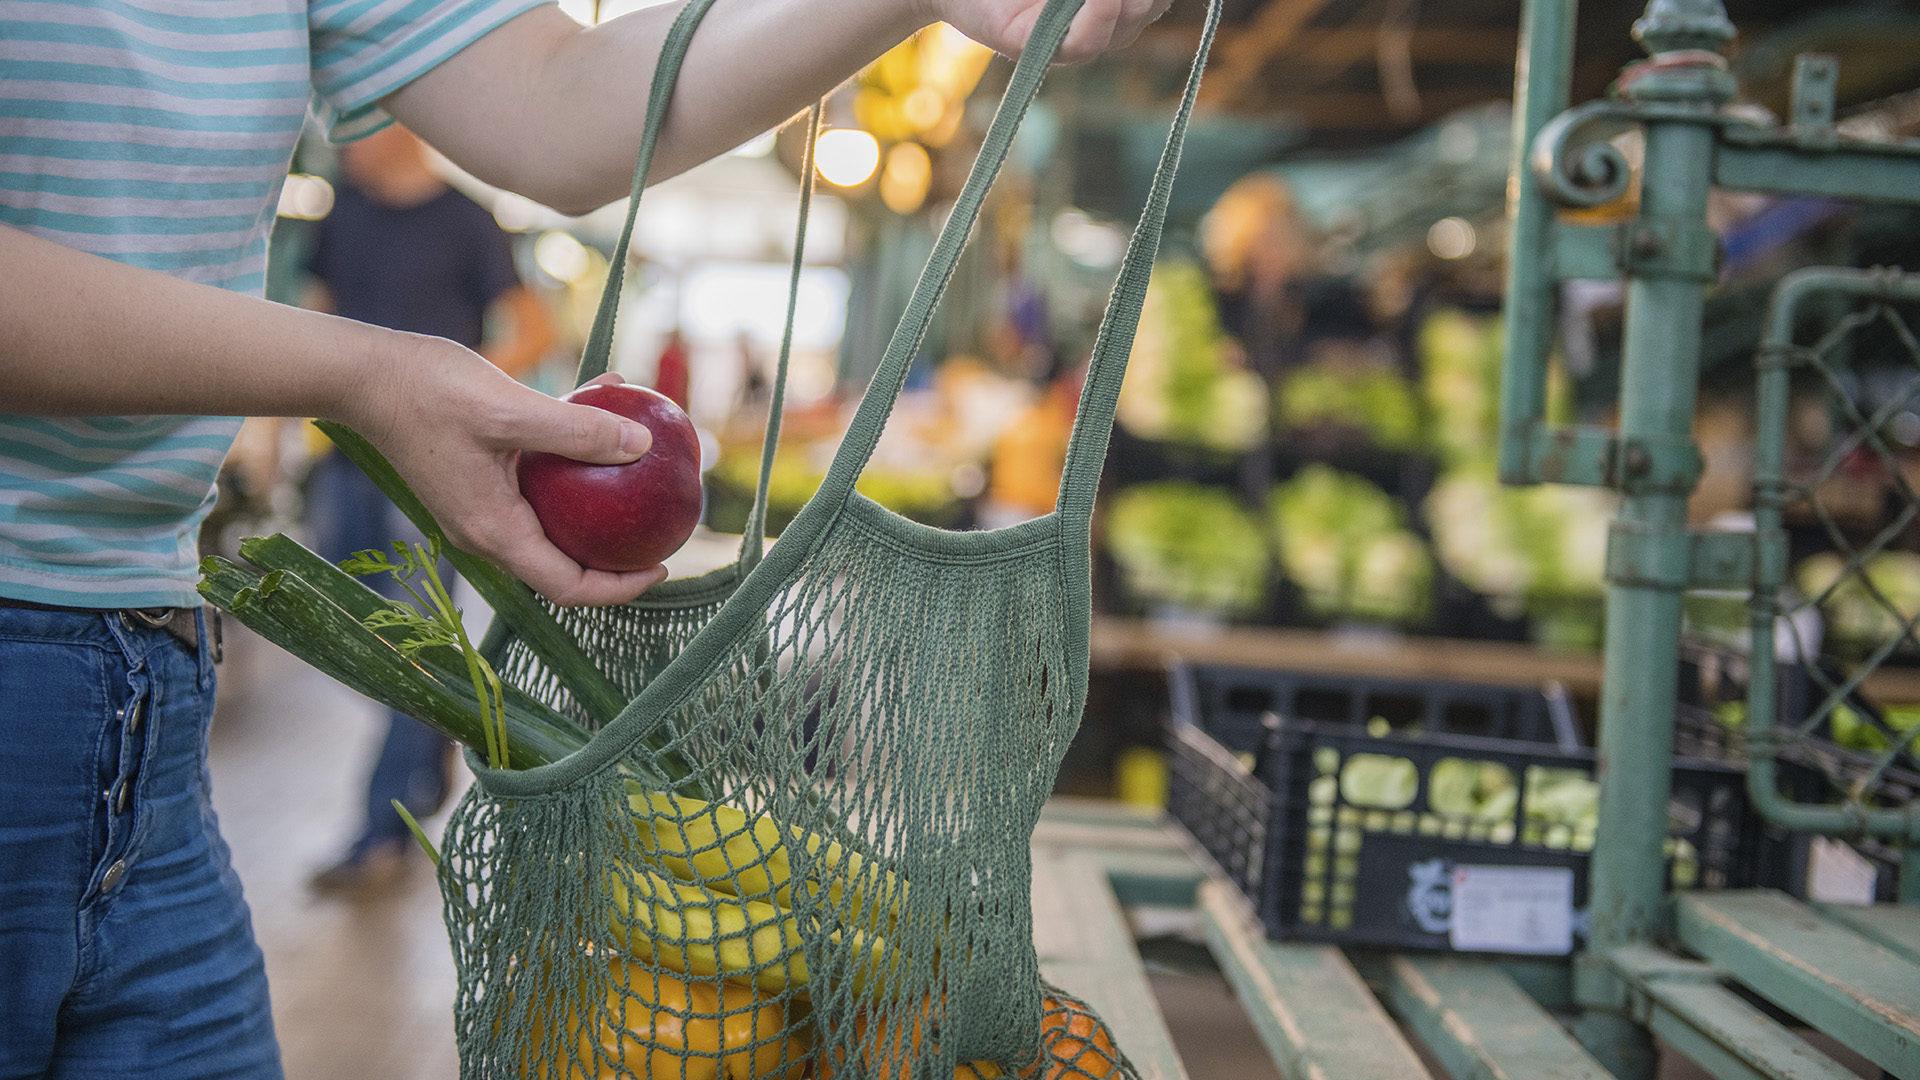 BBVA-Compra-Ecologia-alimentación-productos-fruta-sostenible-alimentos-supermercado